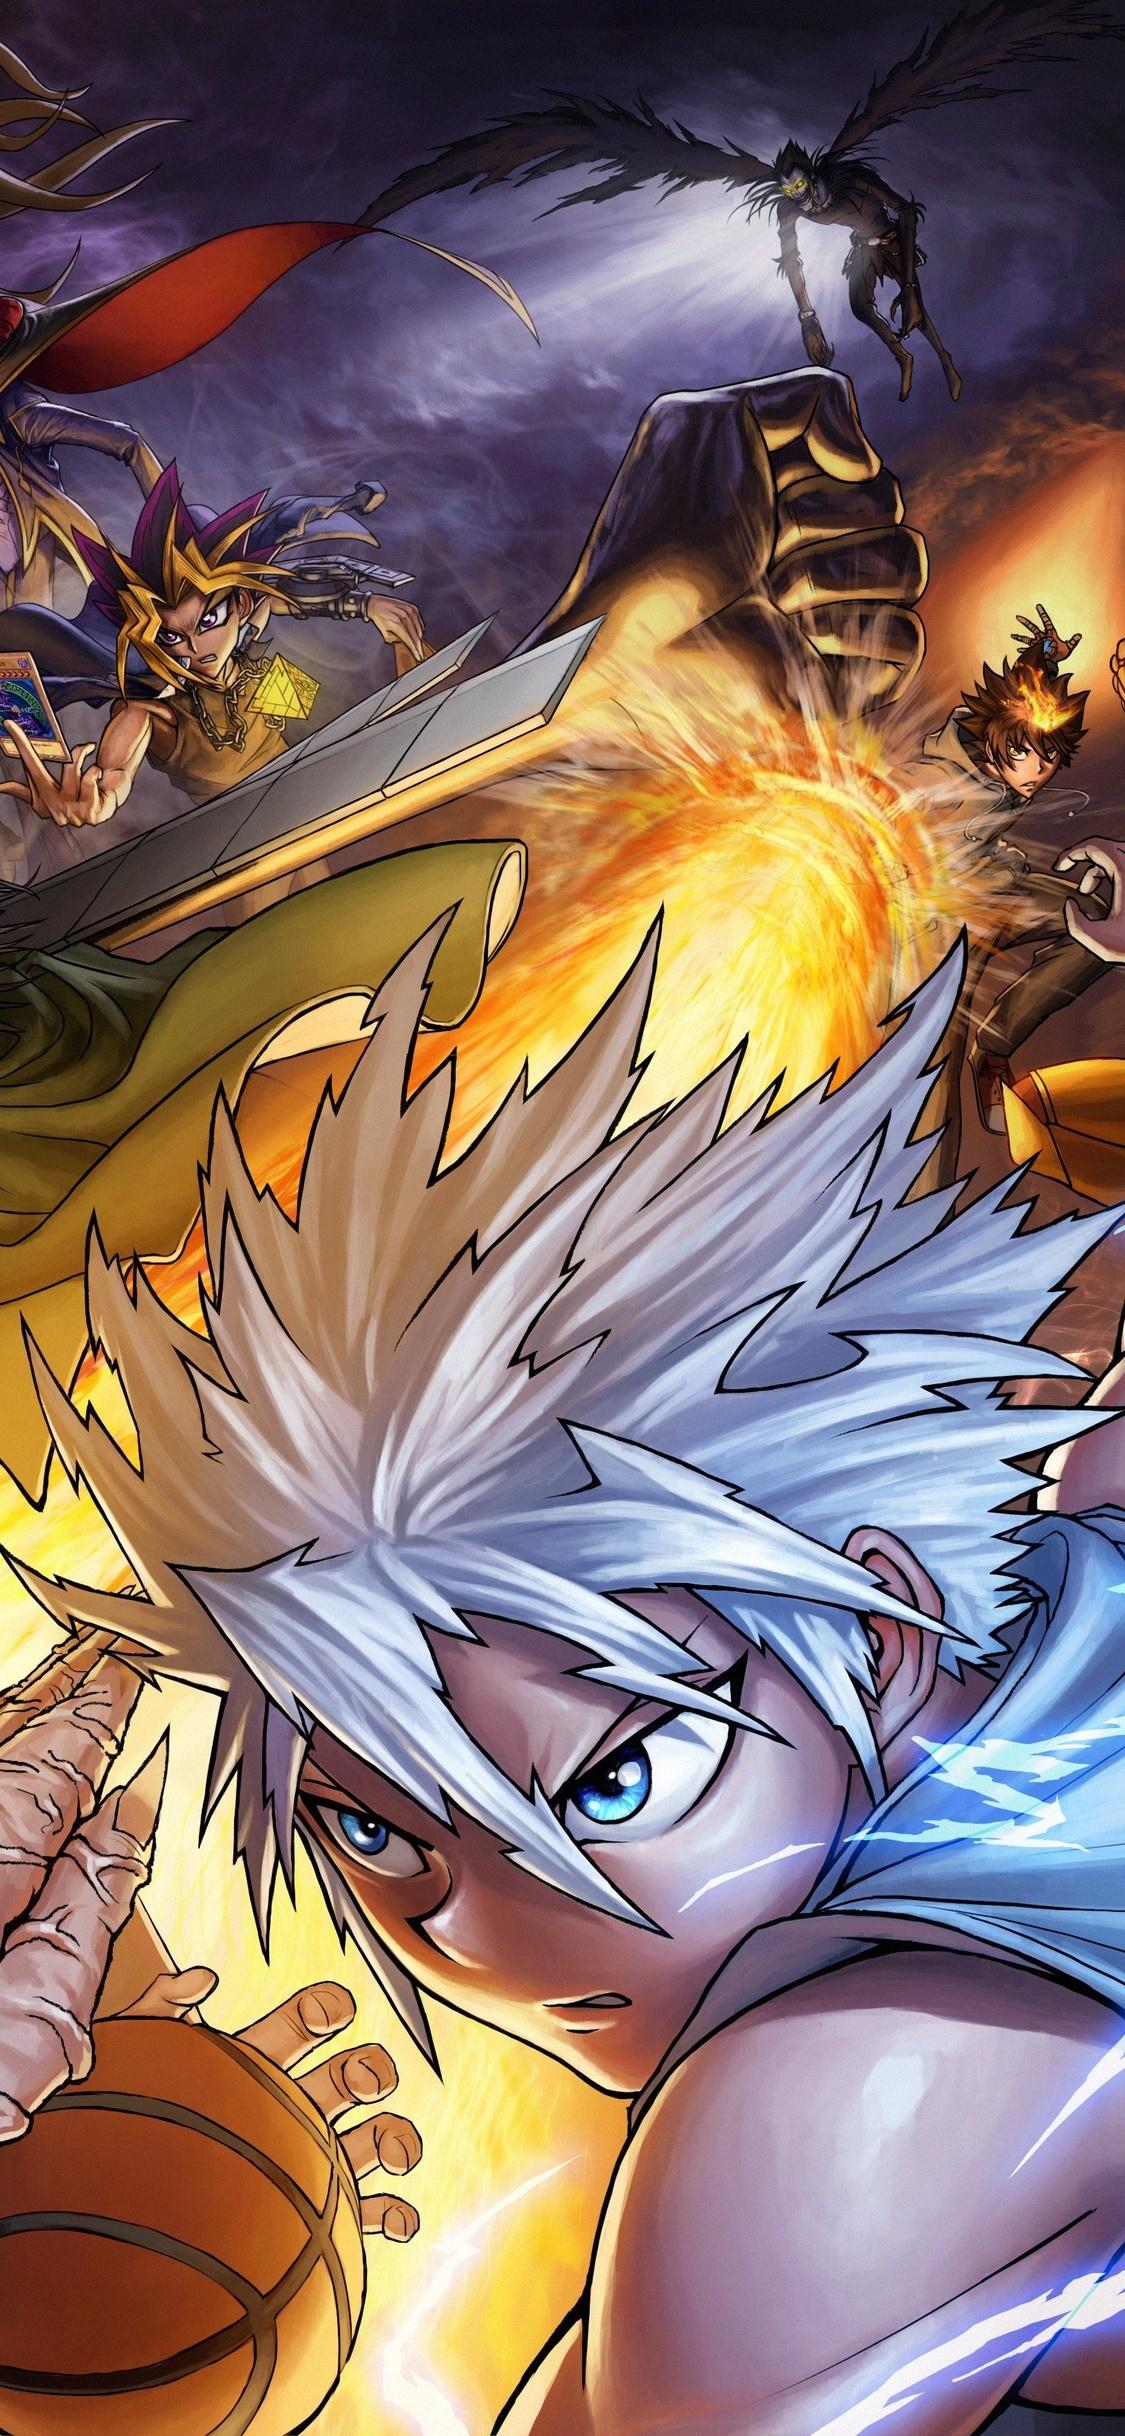 1125x2436 Atemu Bleach Crossover Dragonball Naruto Iphone Xs